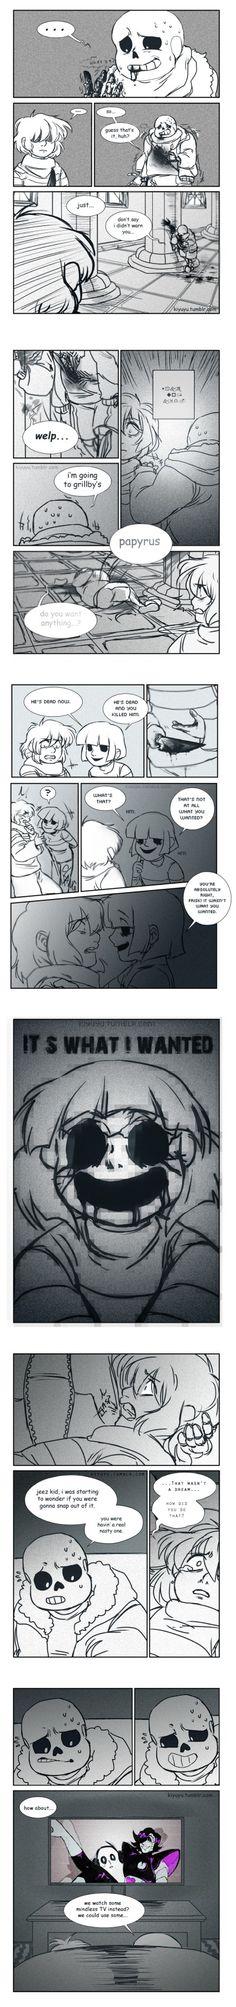 Sans, Frisk, and Chara #comic #blood genocide